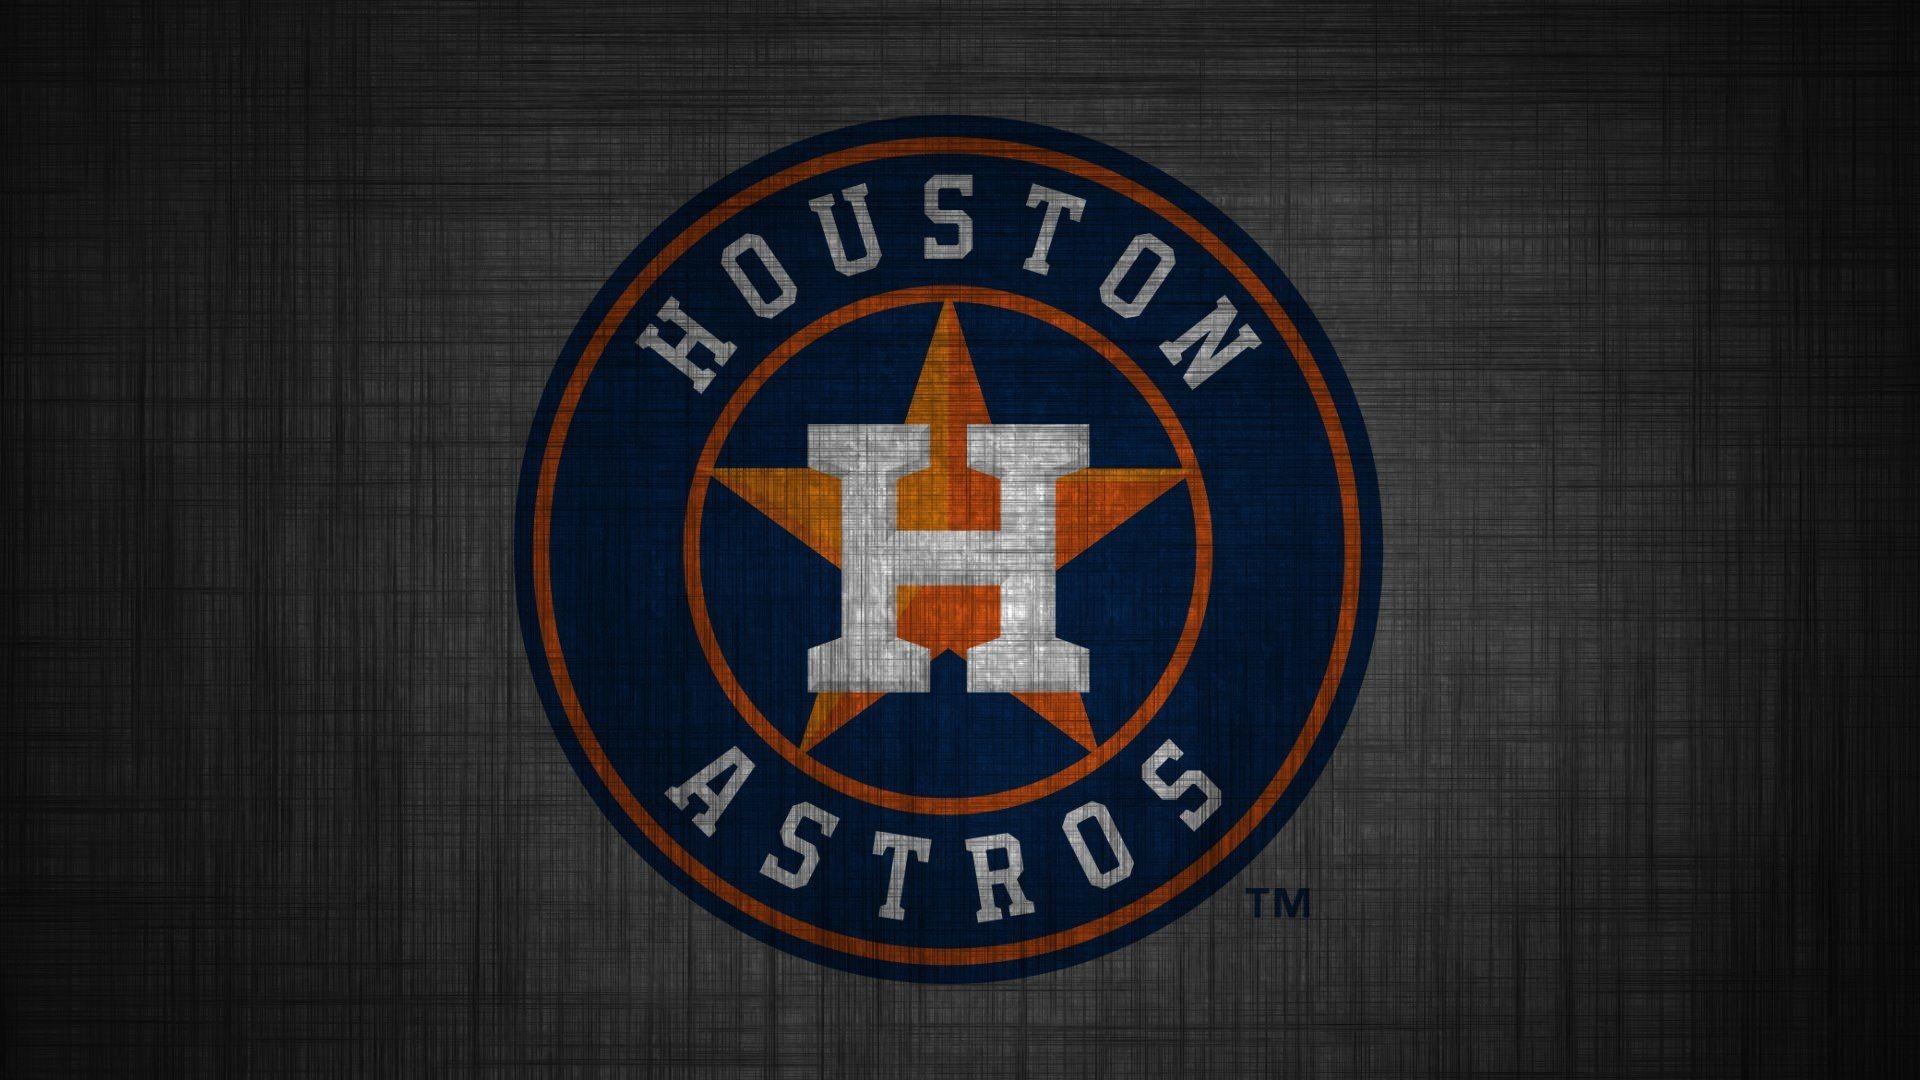 Houston Astros Wallpaper HD